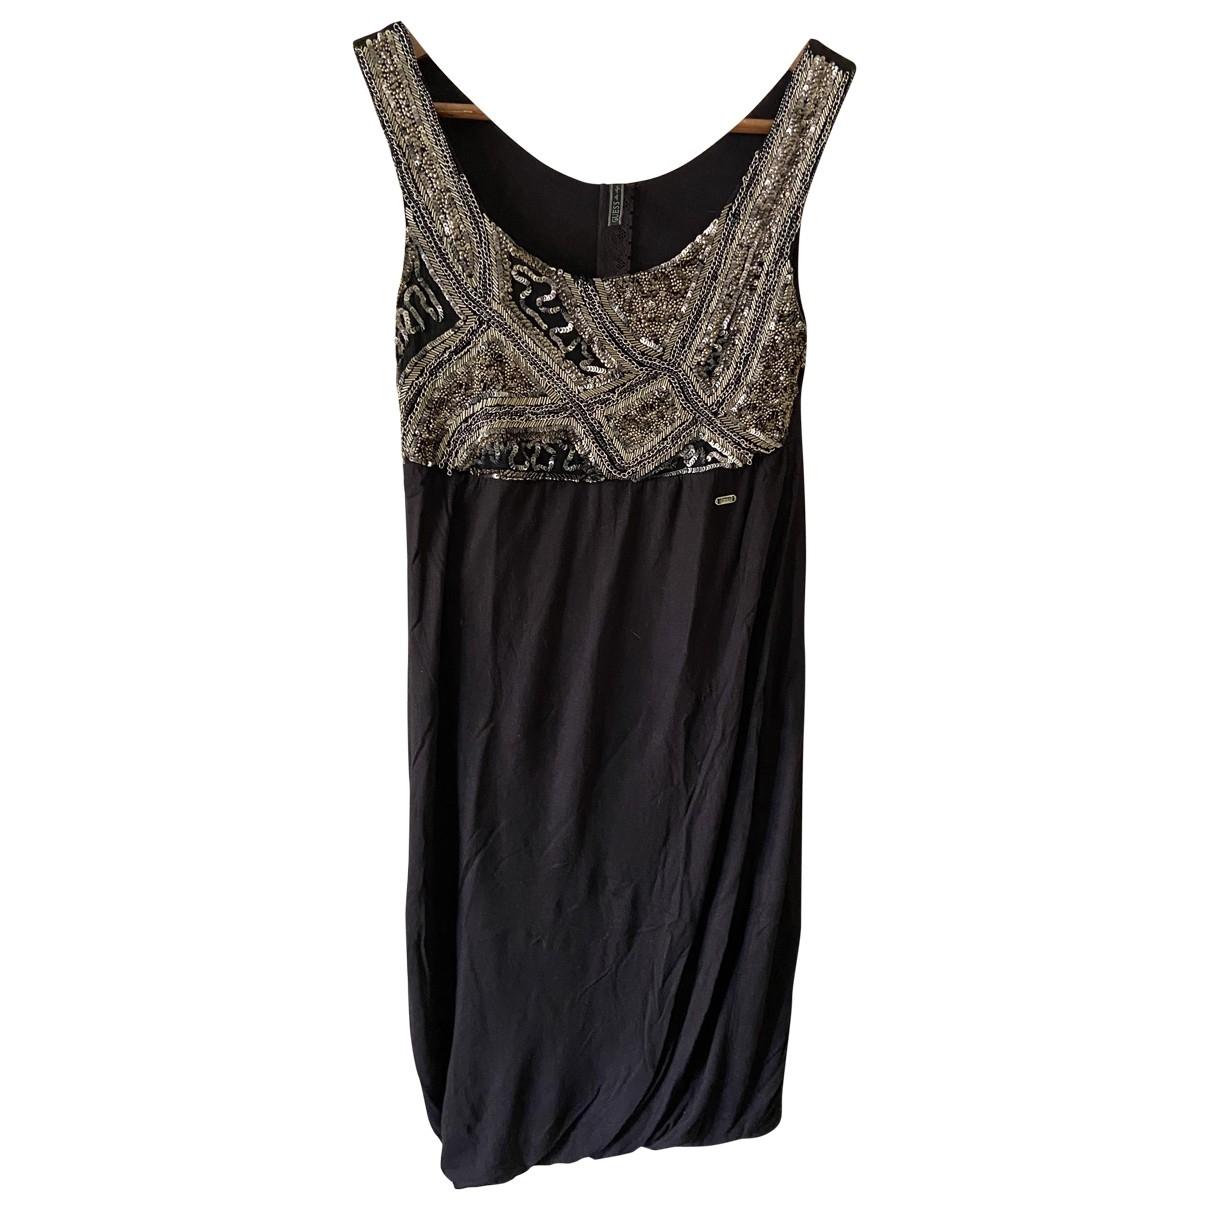 Guess \N Black Cotton dress for Women S International